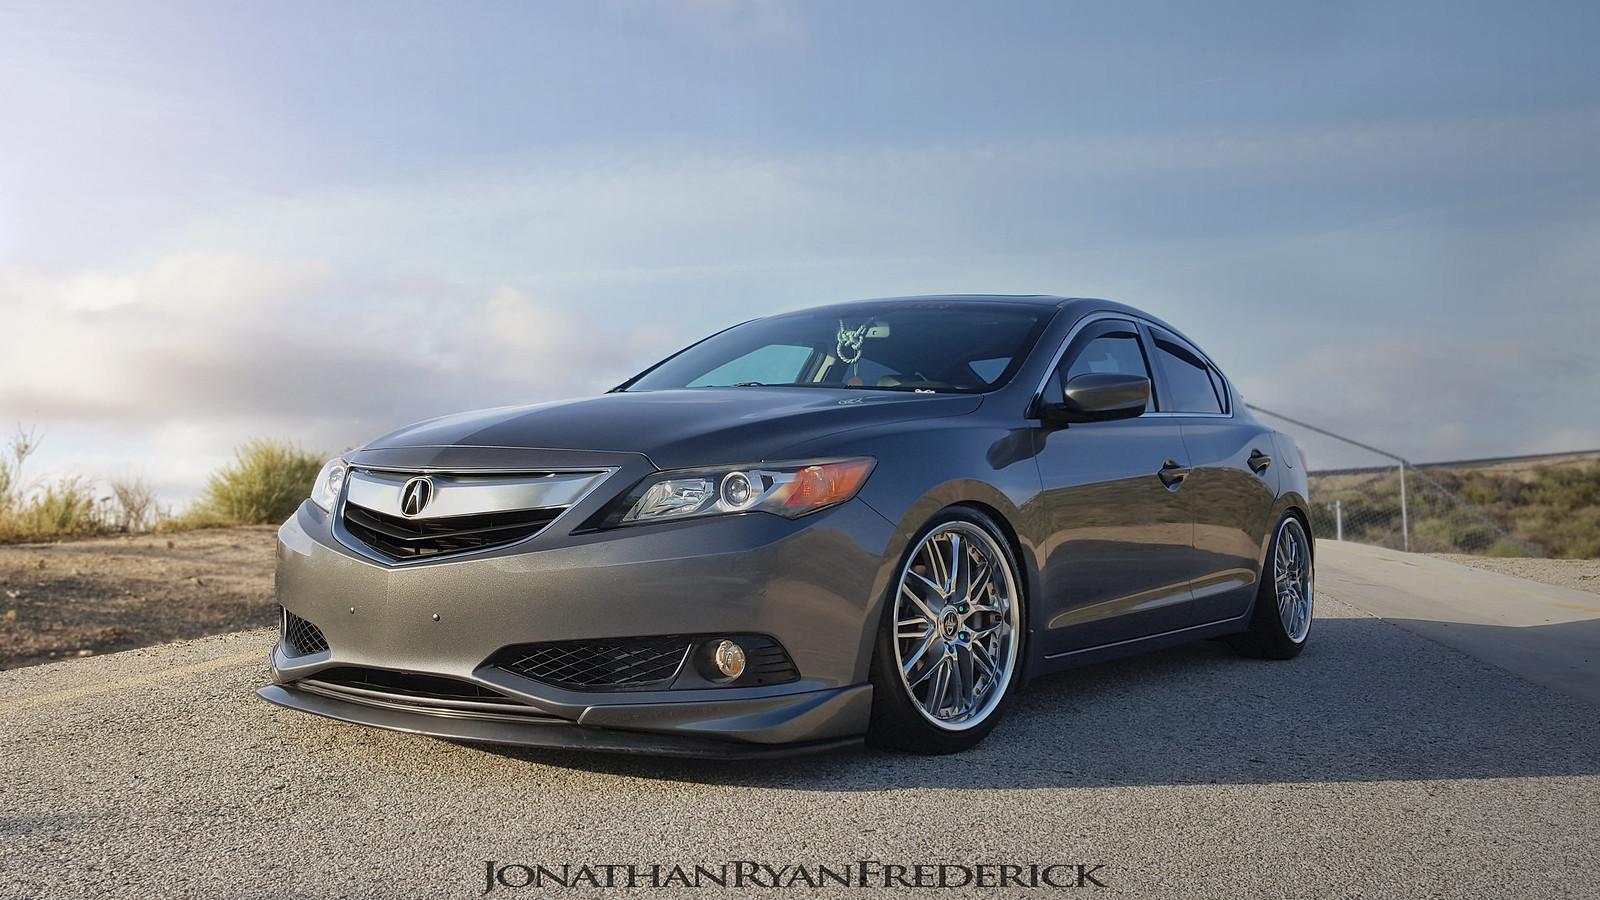 2013 ILX On Weds Kranze Borphes : Acura